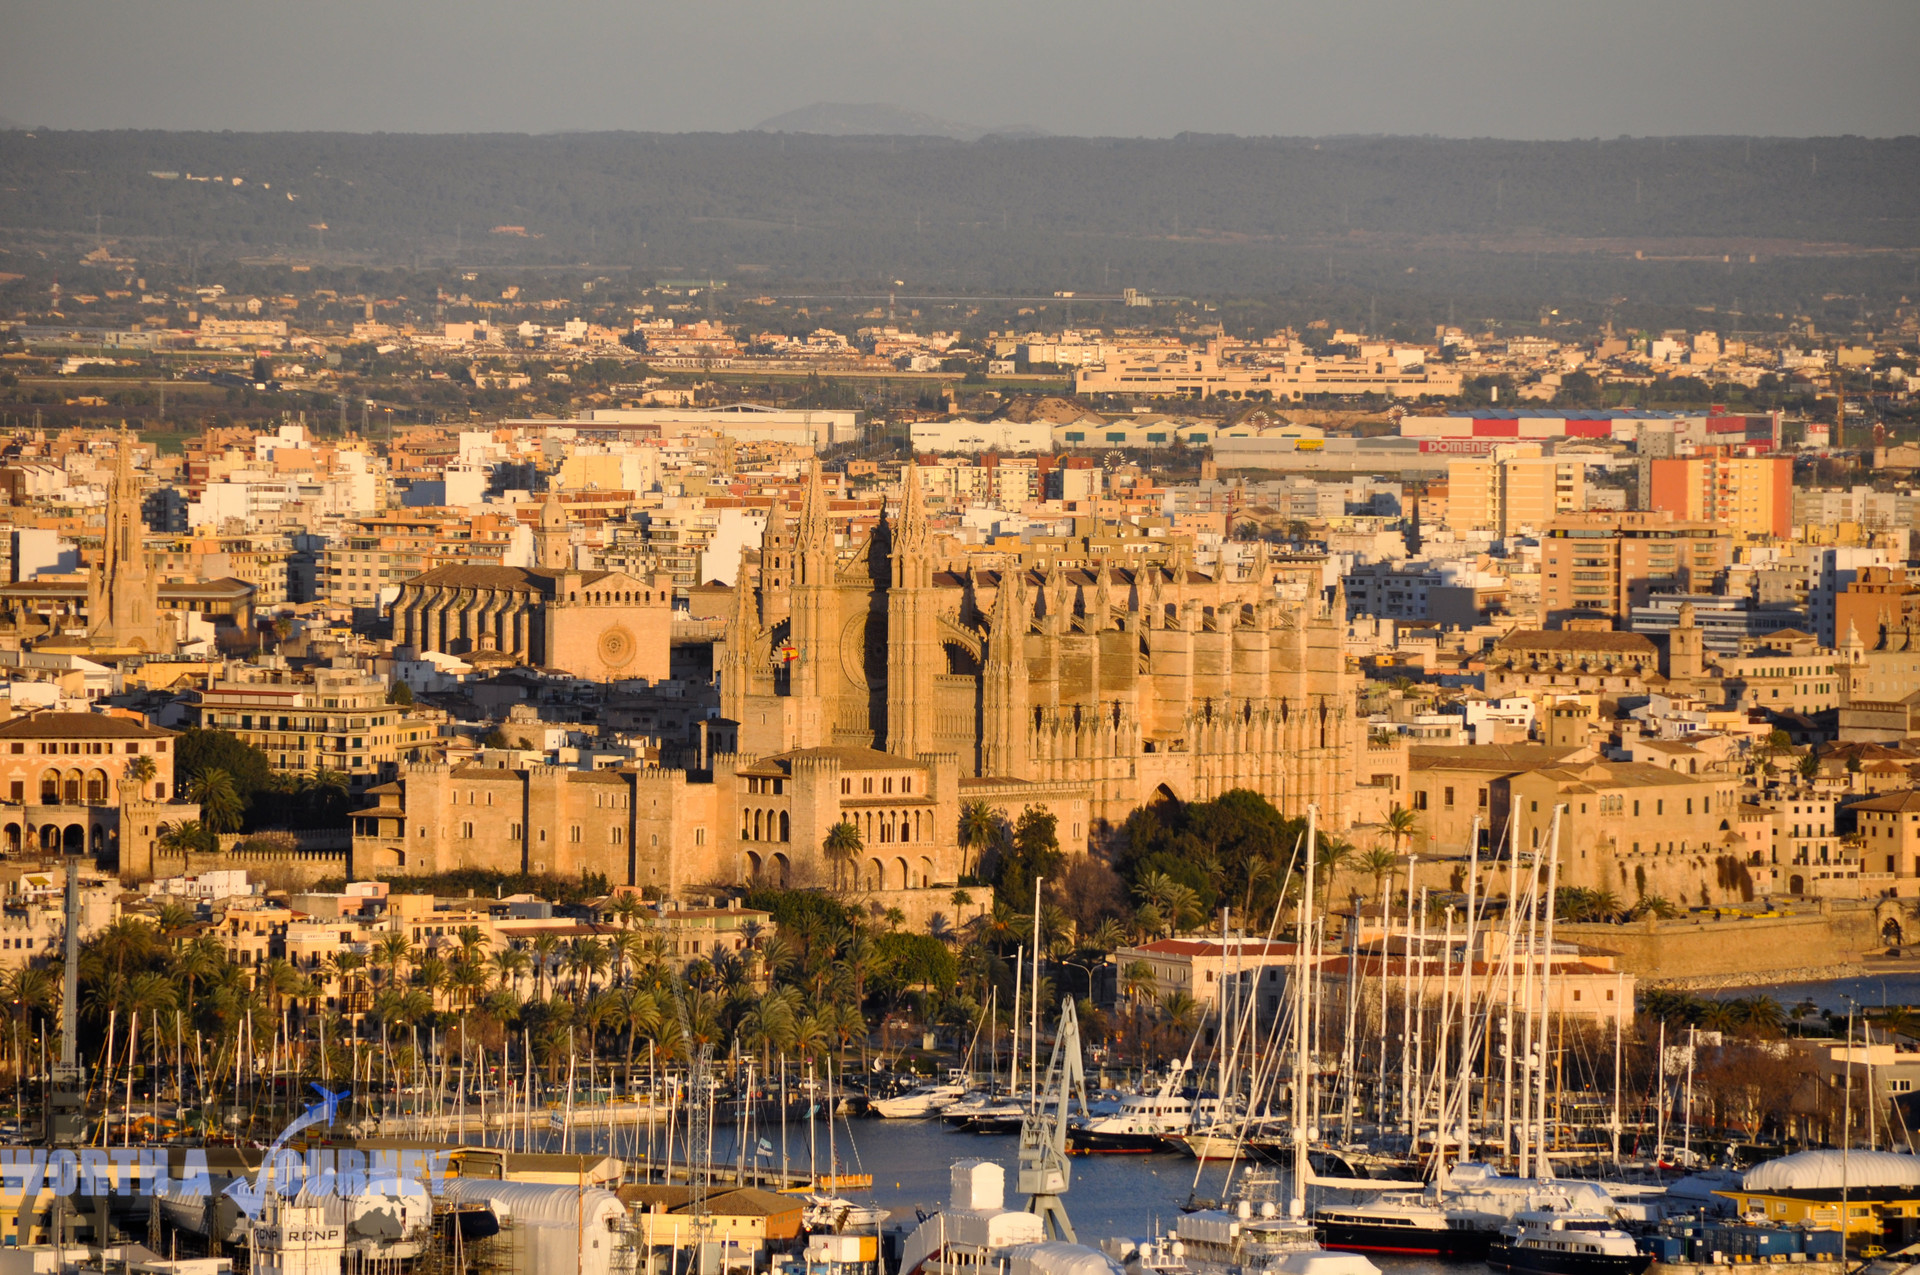 De belevenis in Palma de Mallorca, Spanje (van Hugo)